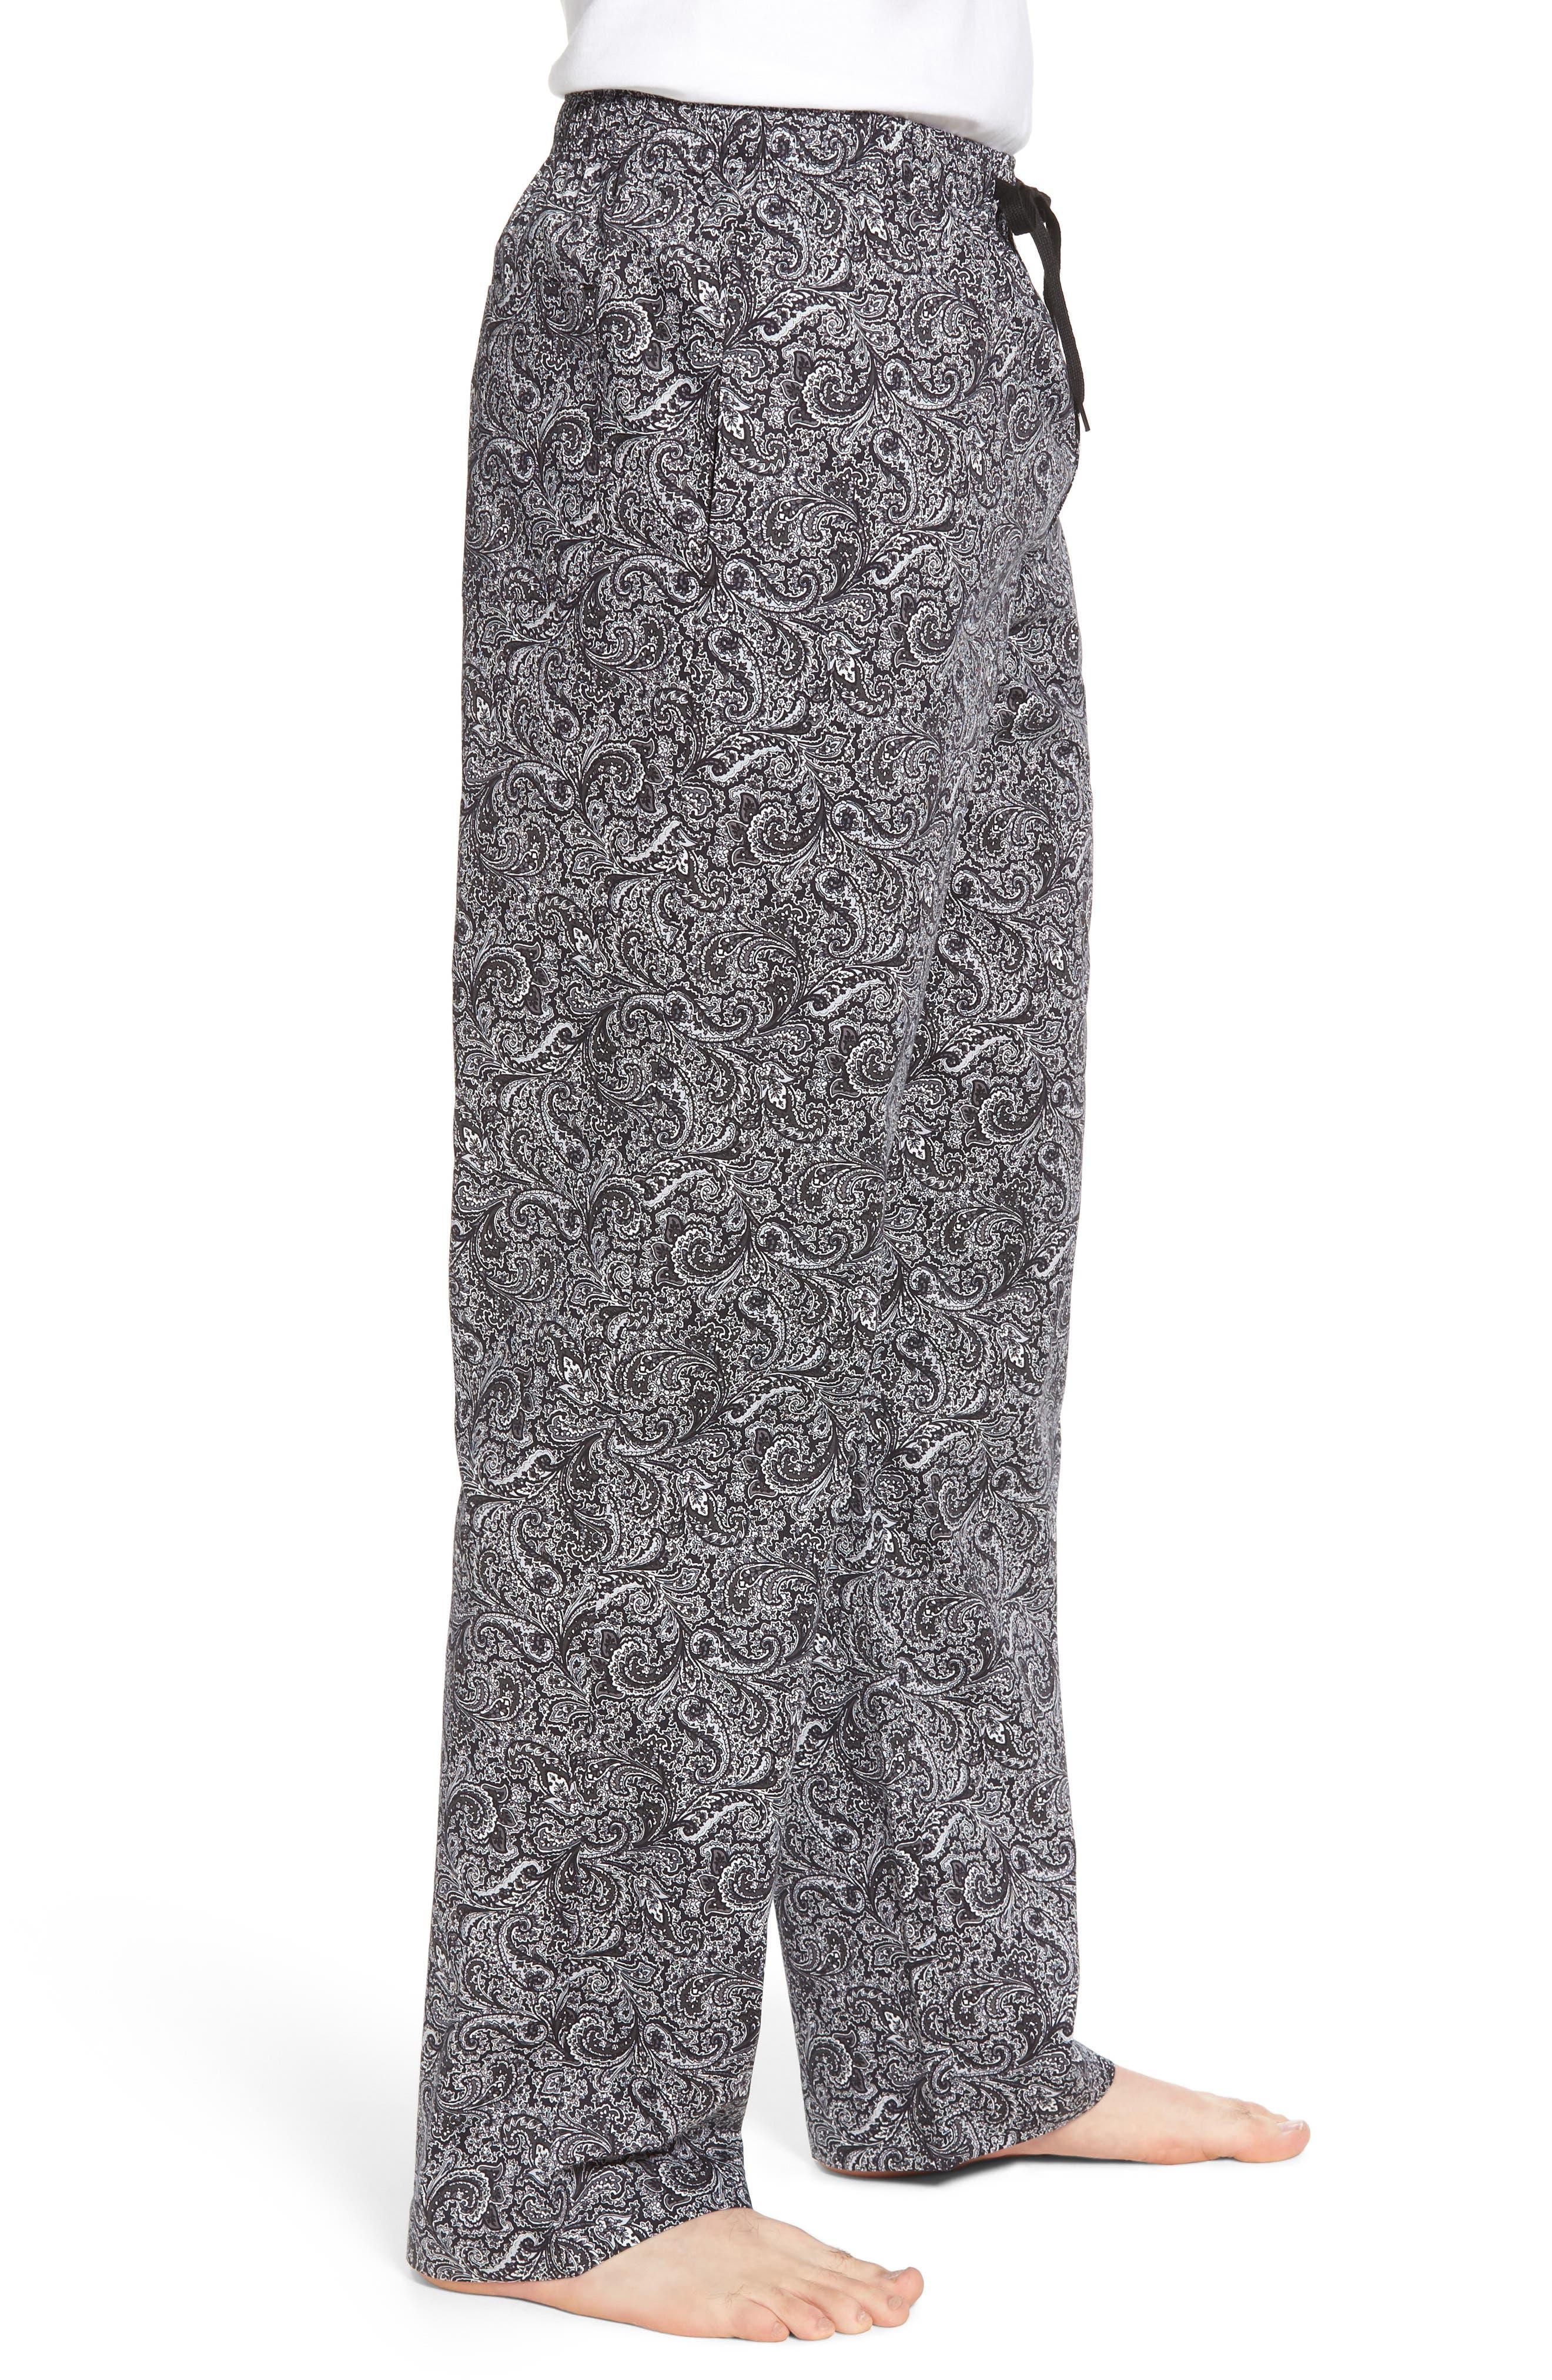 Starling Lounge Pants,                             Alternate thumbnail 3, color,                             Black Paisley